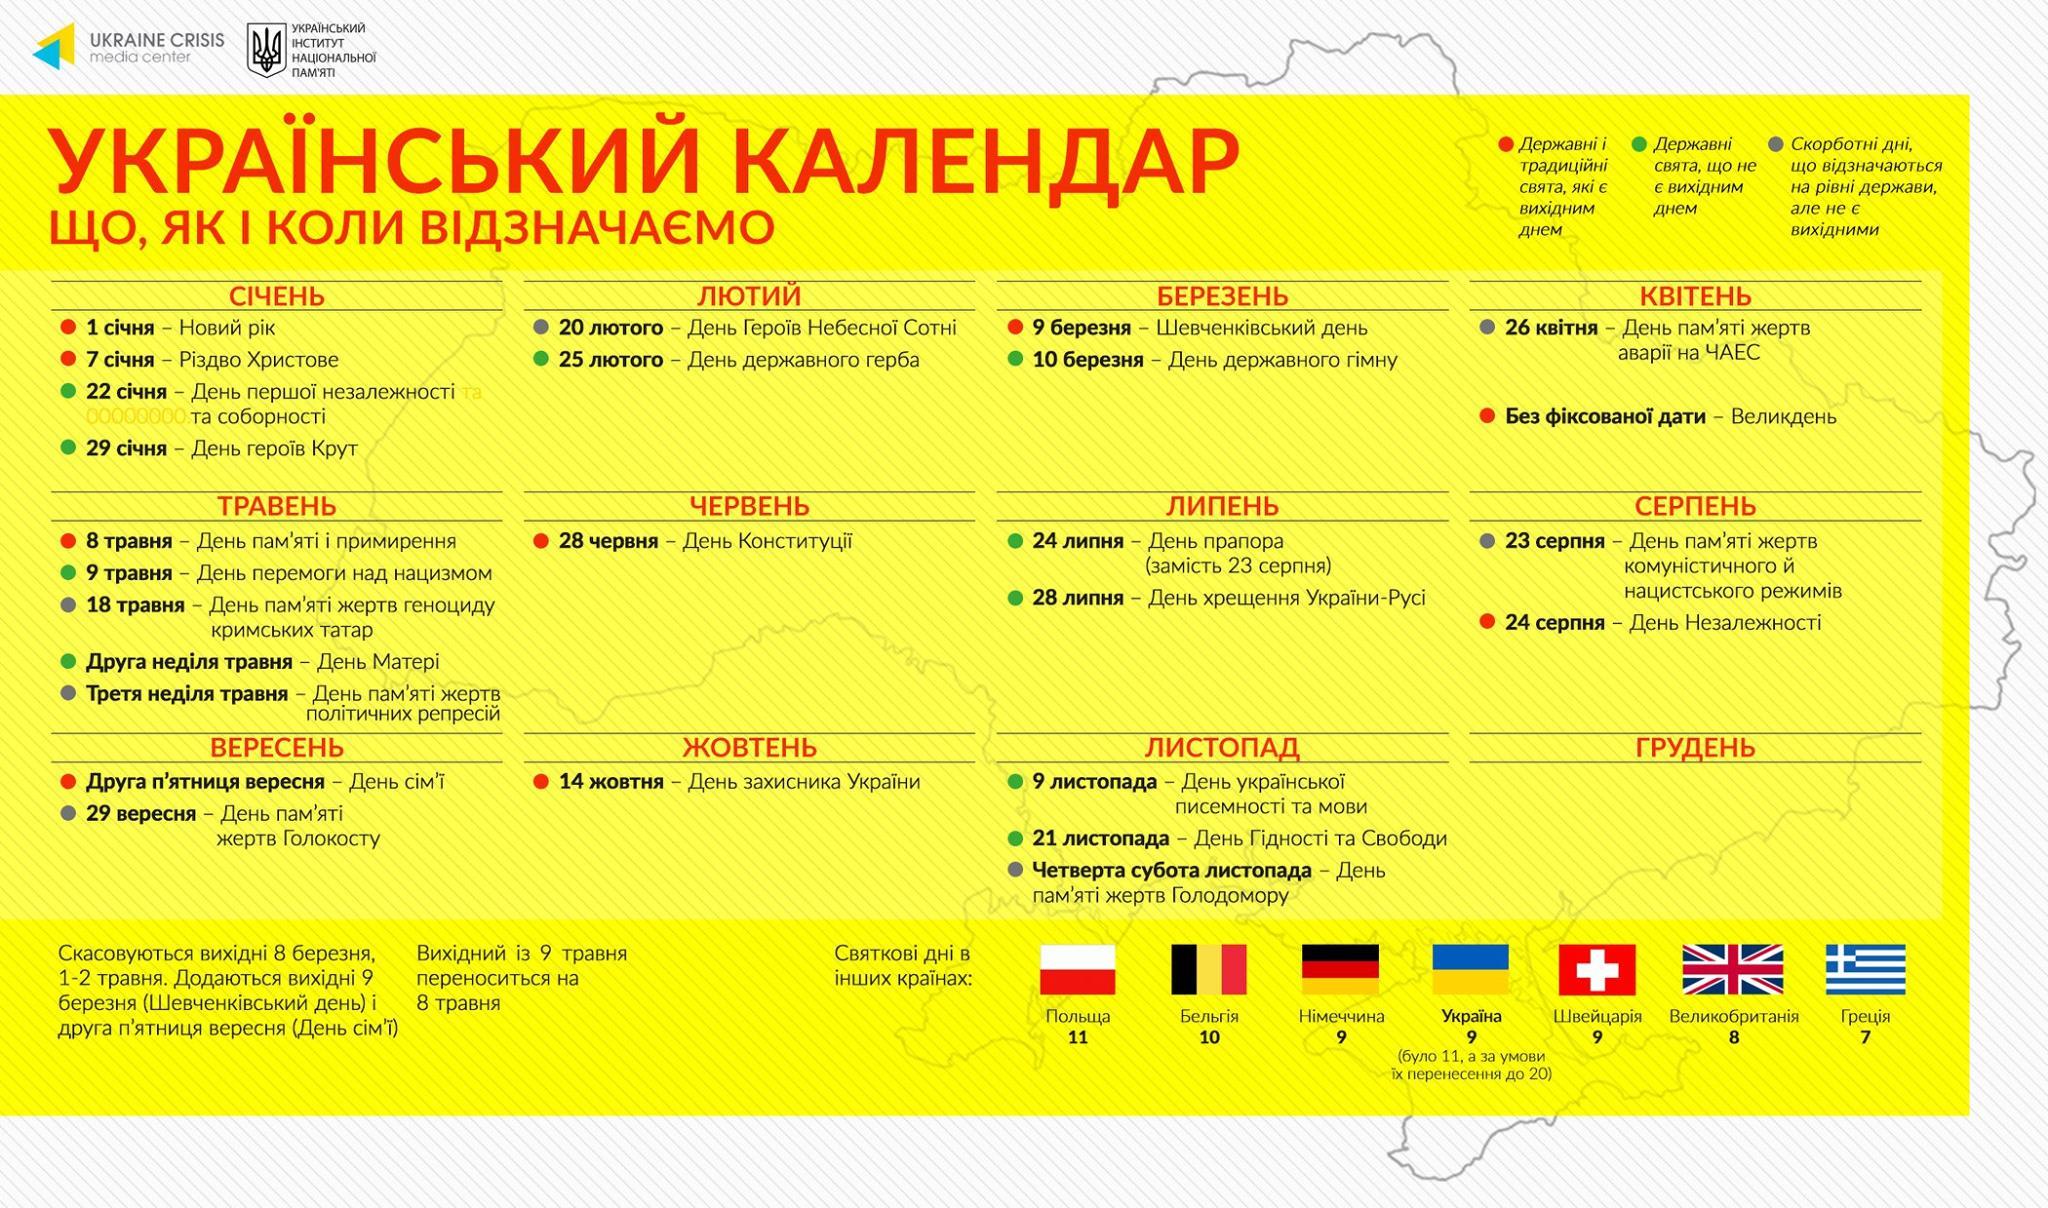 Календарь игр спартака 16-17